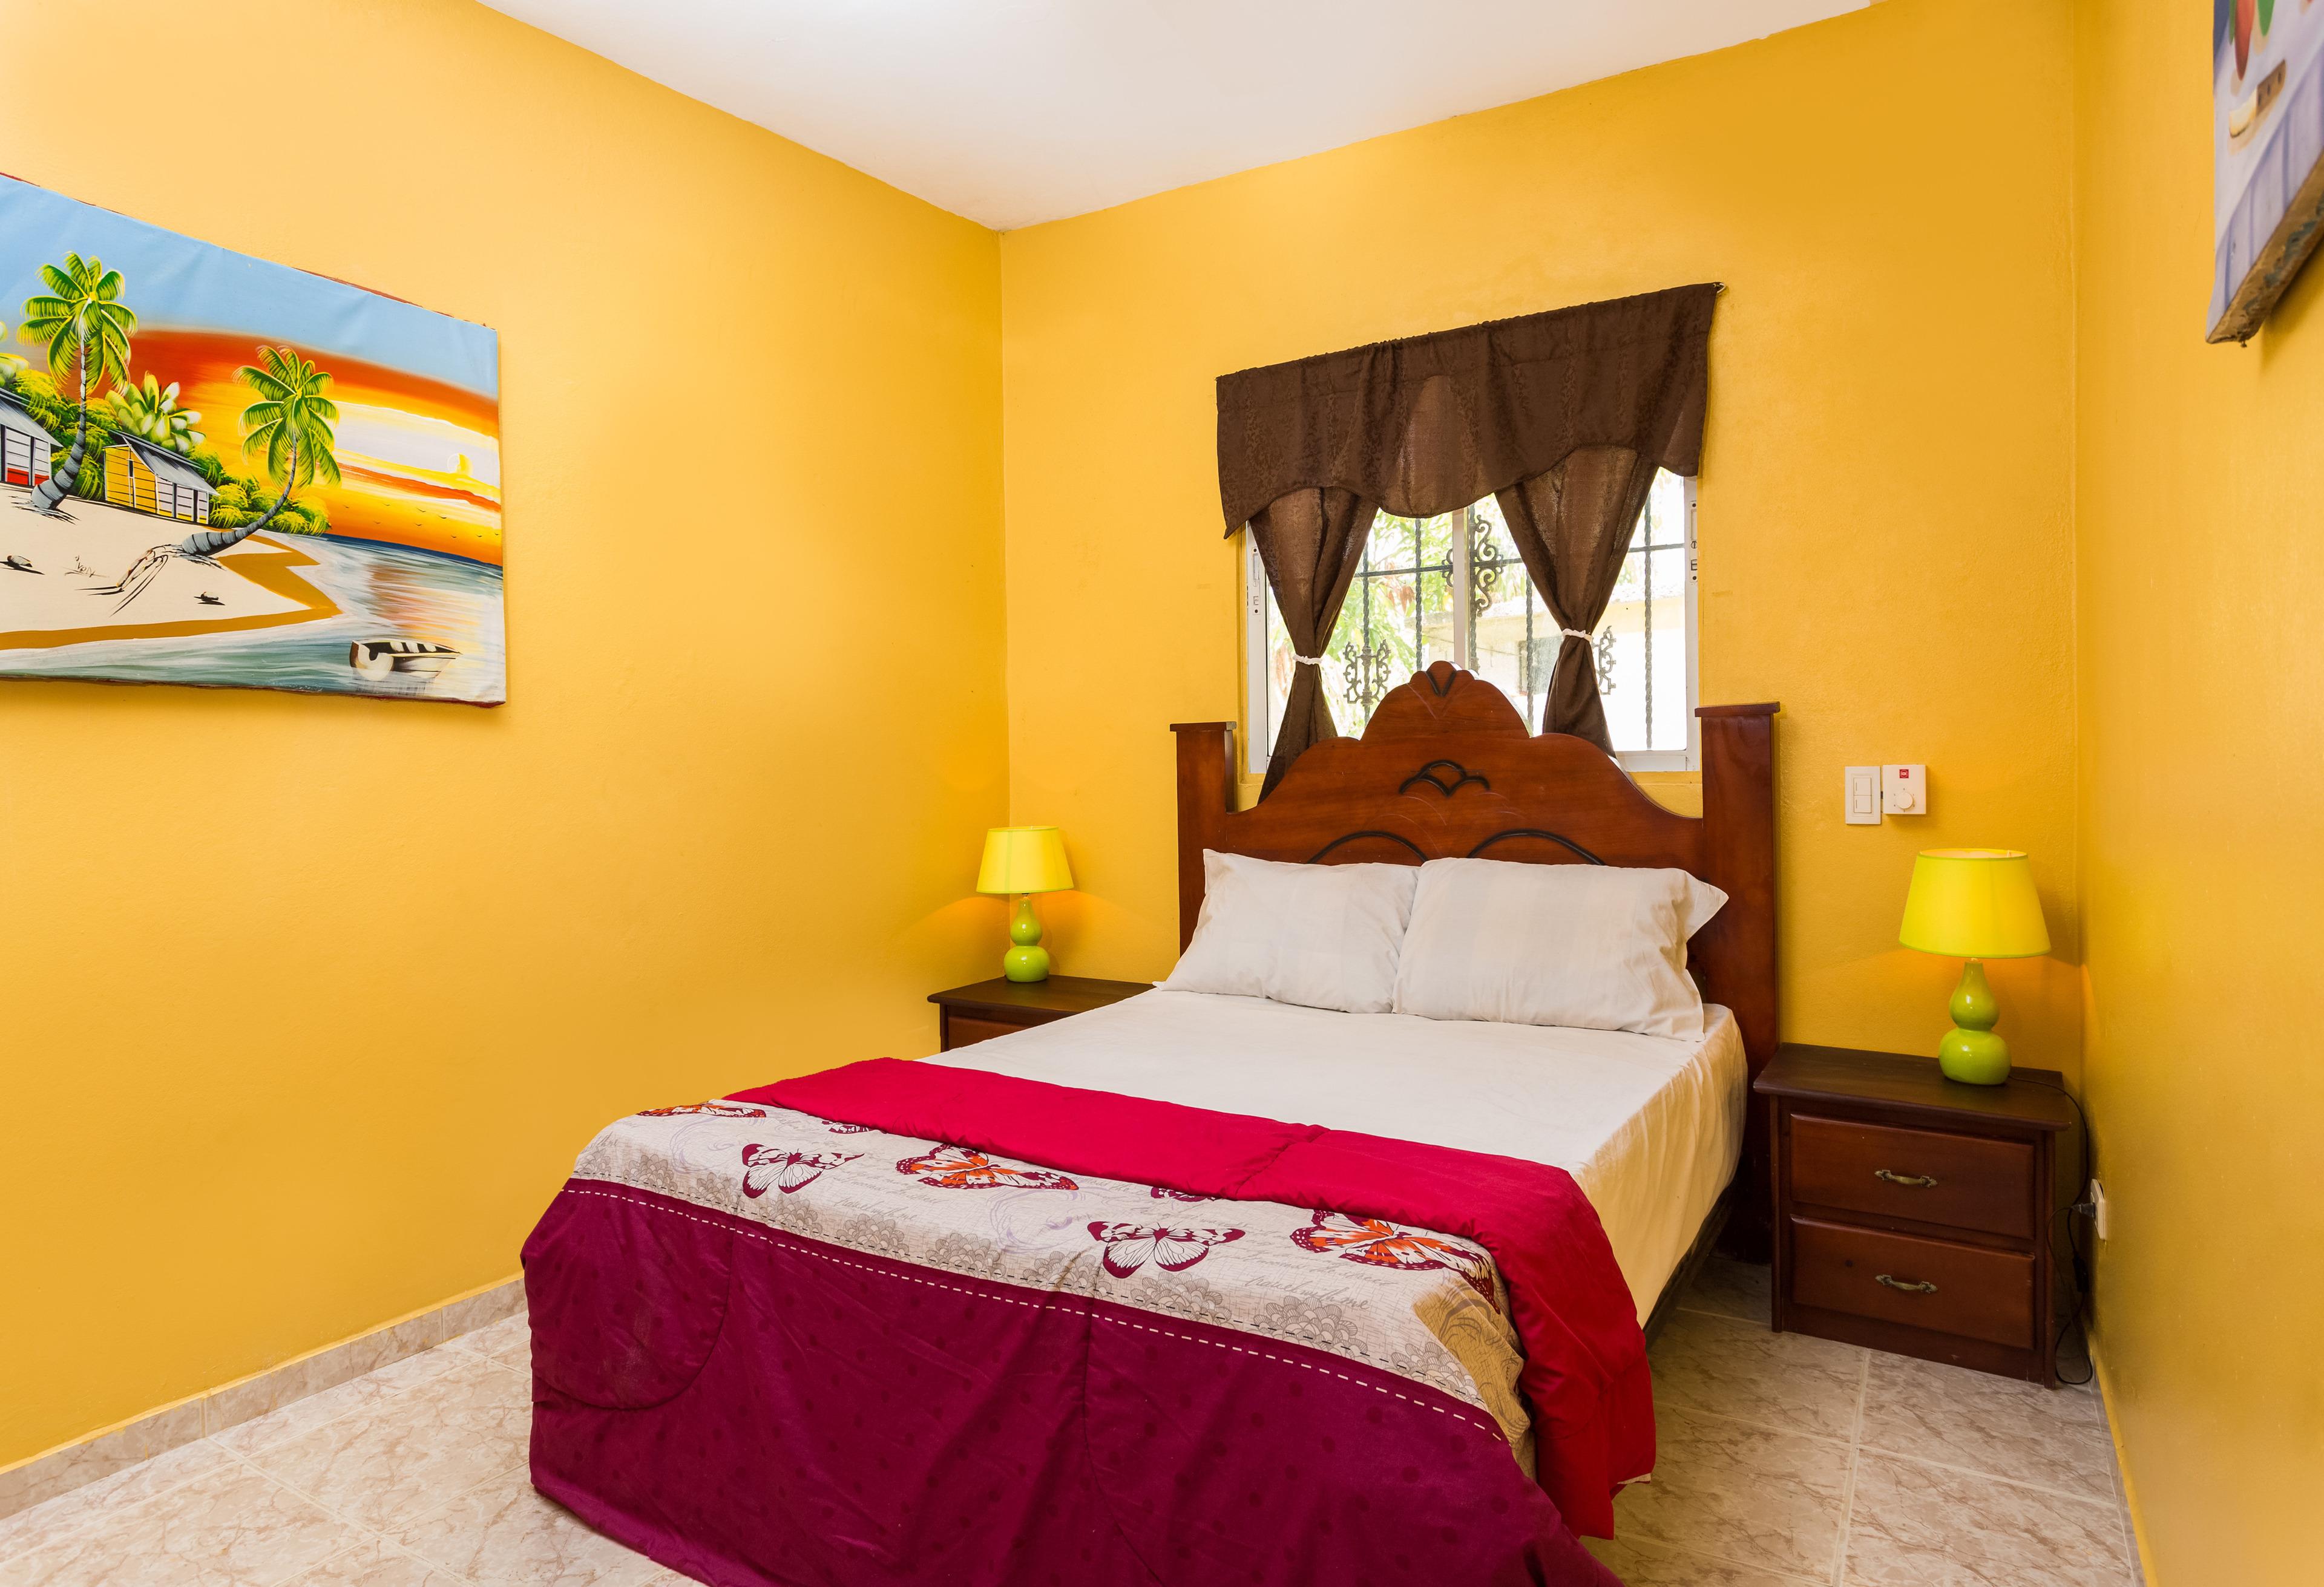 Apartment Samaná - Apt. La Vida Bonita Ferienwohnung in Mittelamerika und Karibik